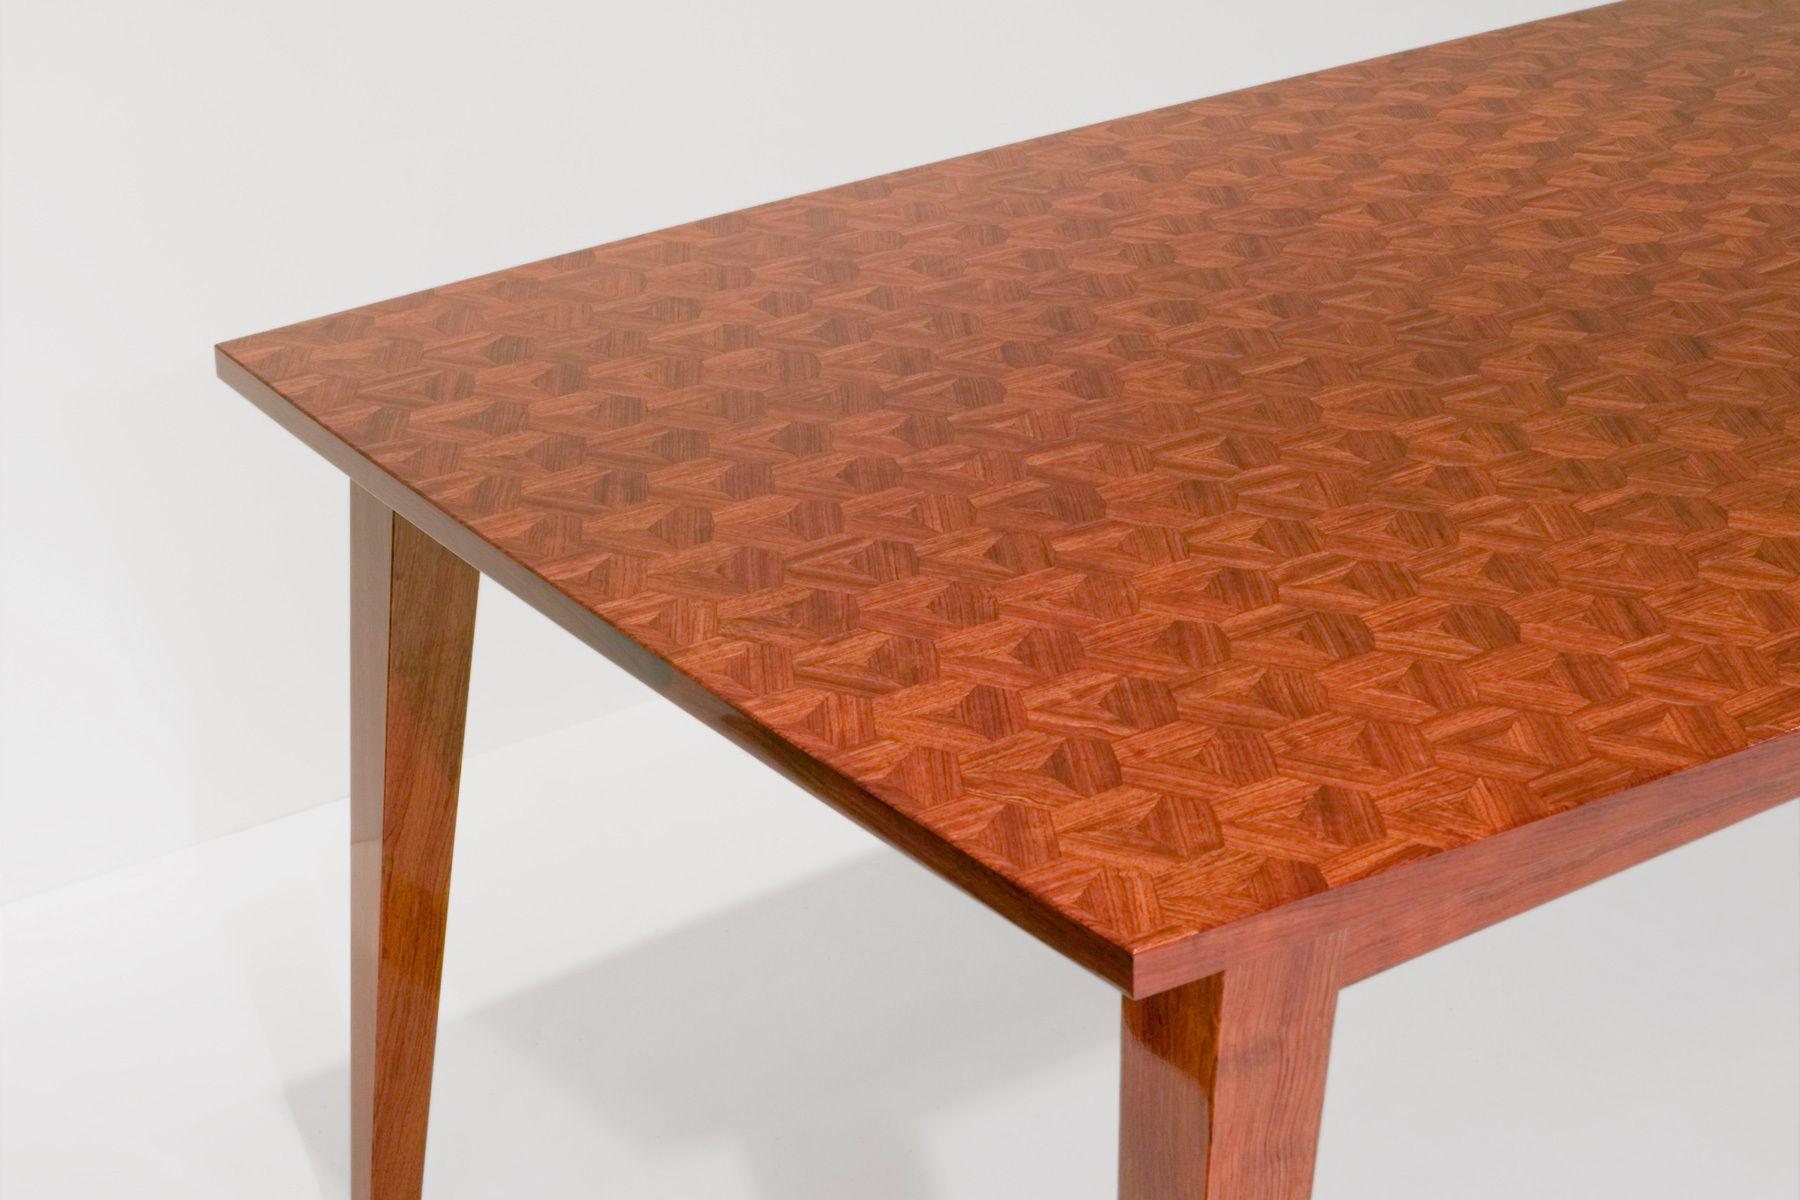 1_aaron_levine_contemporary_modern_studio_furniture_maker_wood_woodworker_art_artist_northwest_parquetry_tessellation_hexed_dining_writing_table_bubinga_landing_detail2.jpg